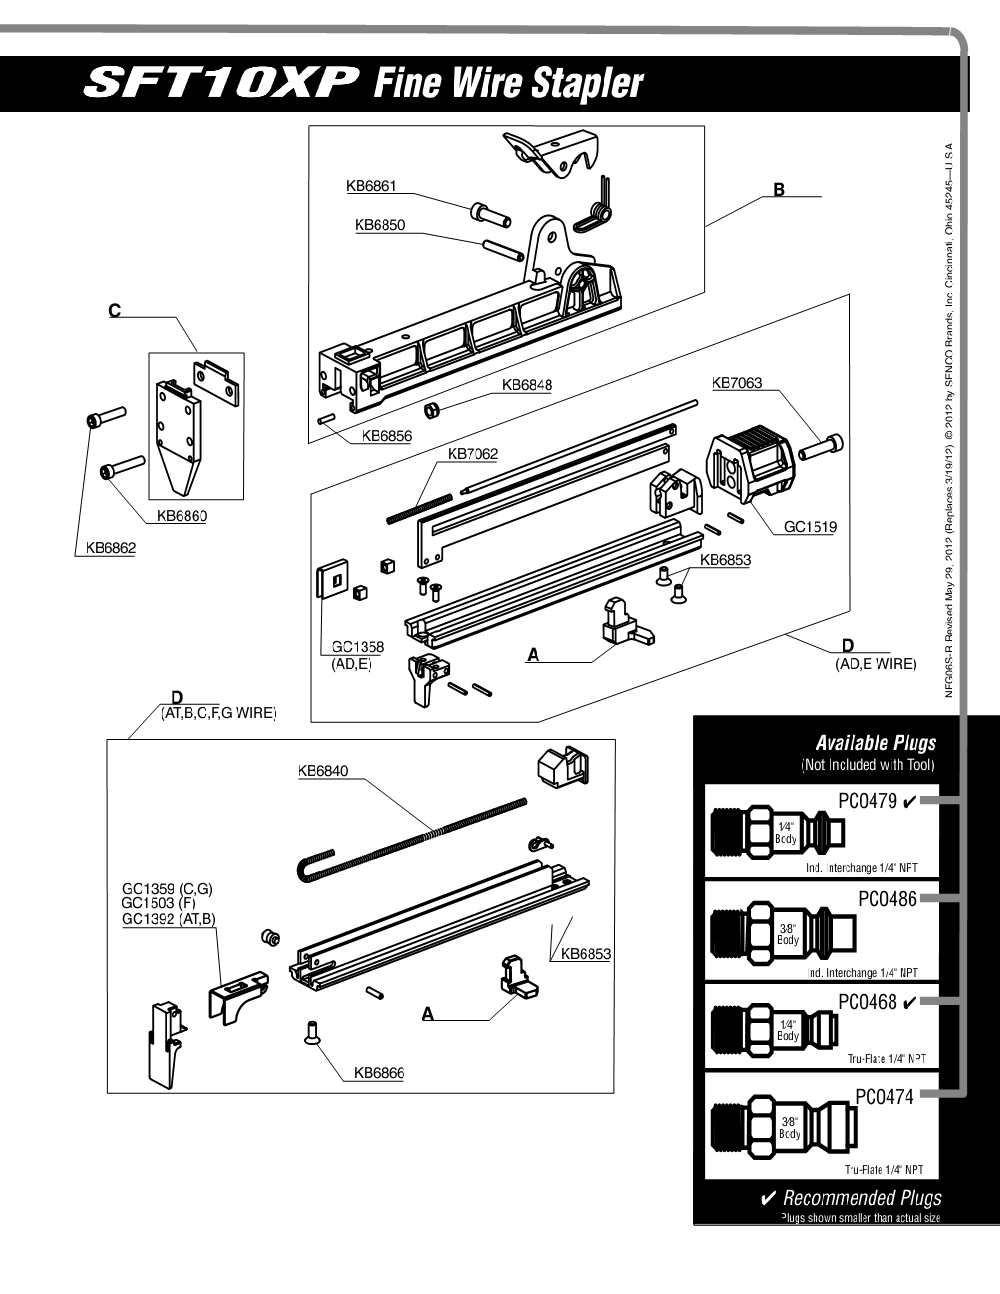 6S0001N-senco-PB-1Break Down